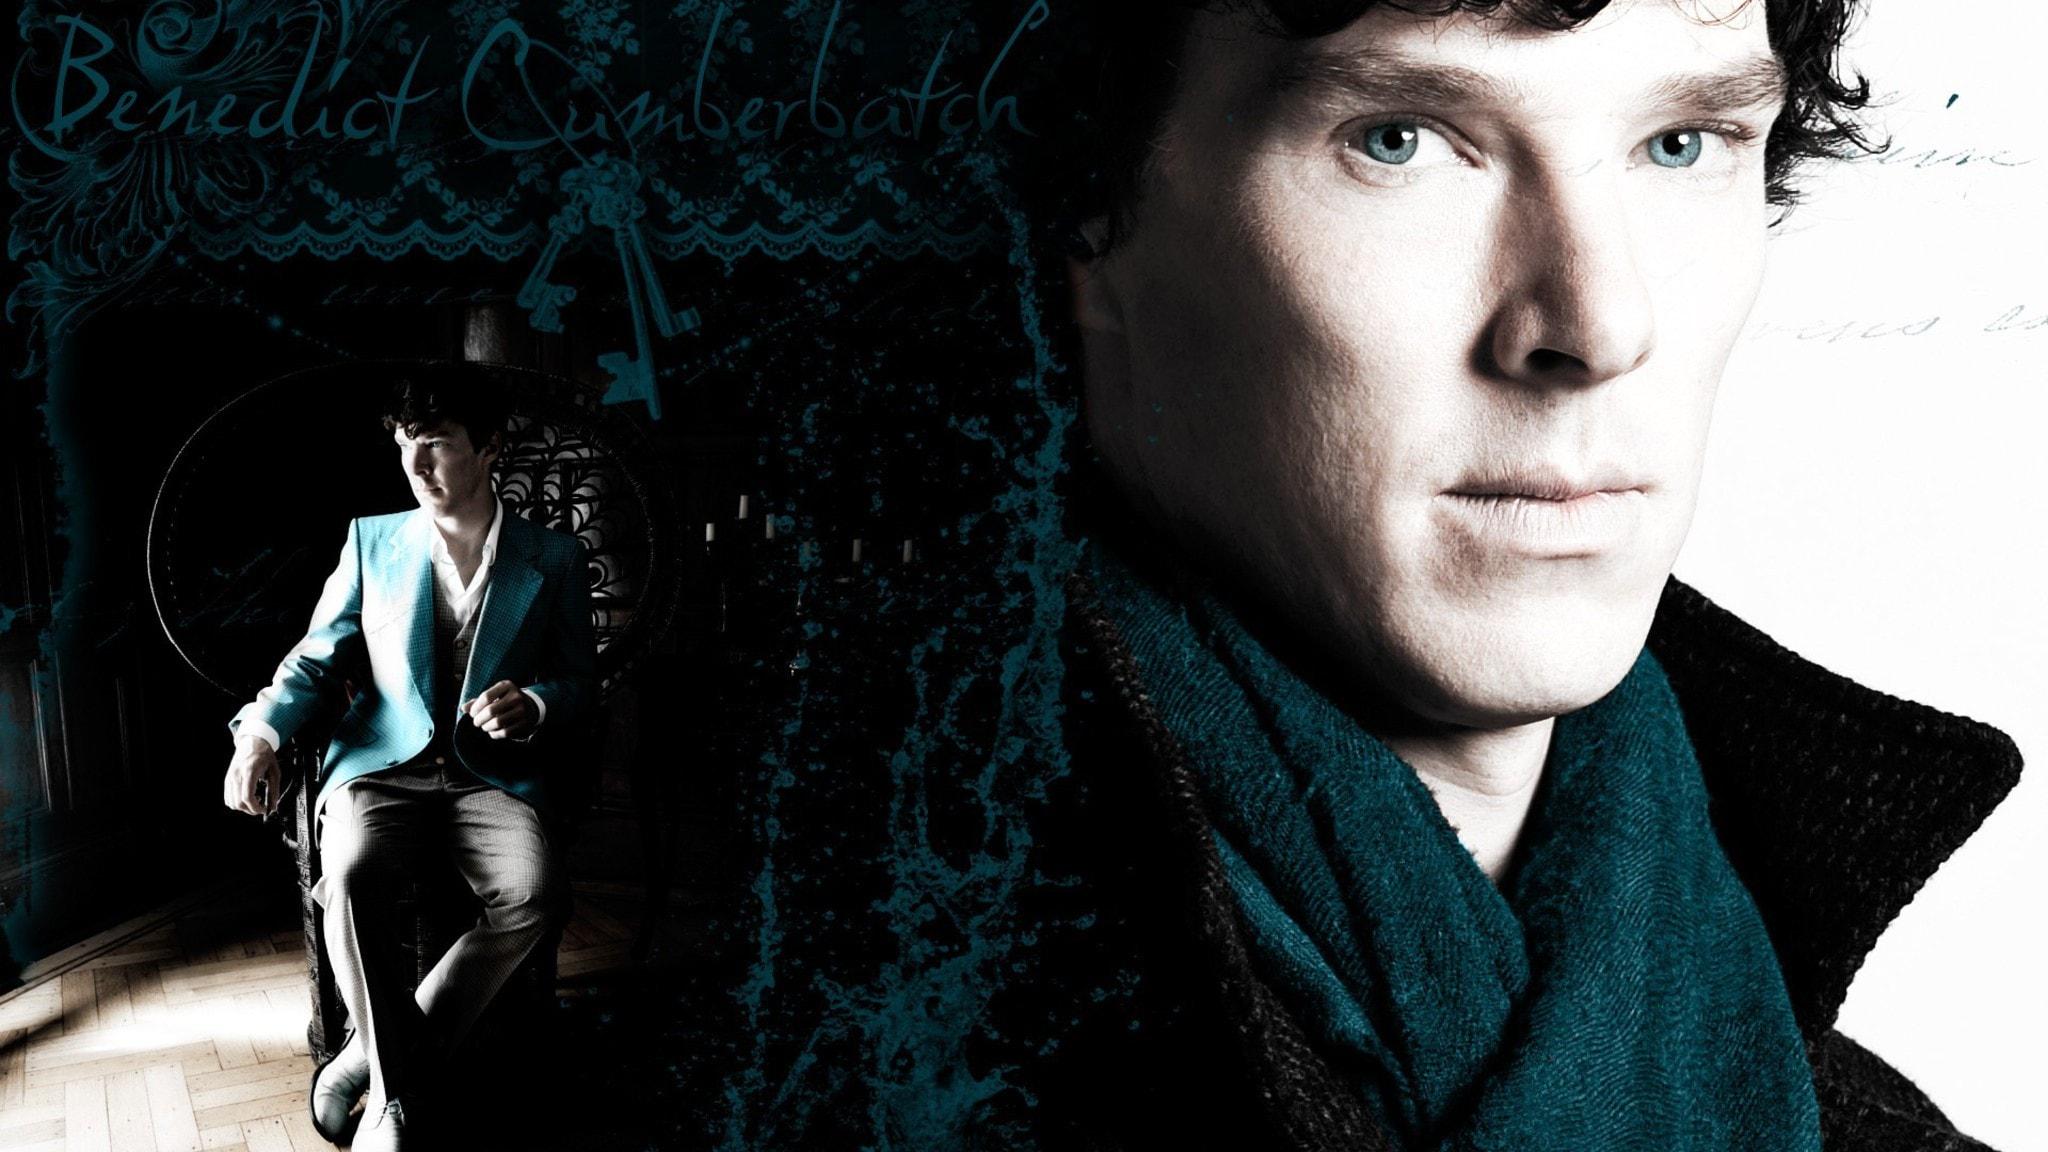 Benedict Cumberbatch widescreen